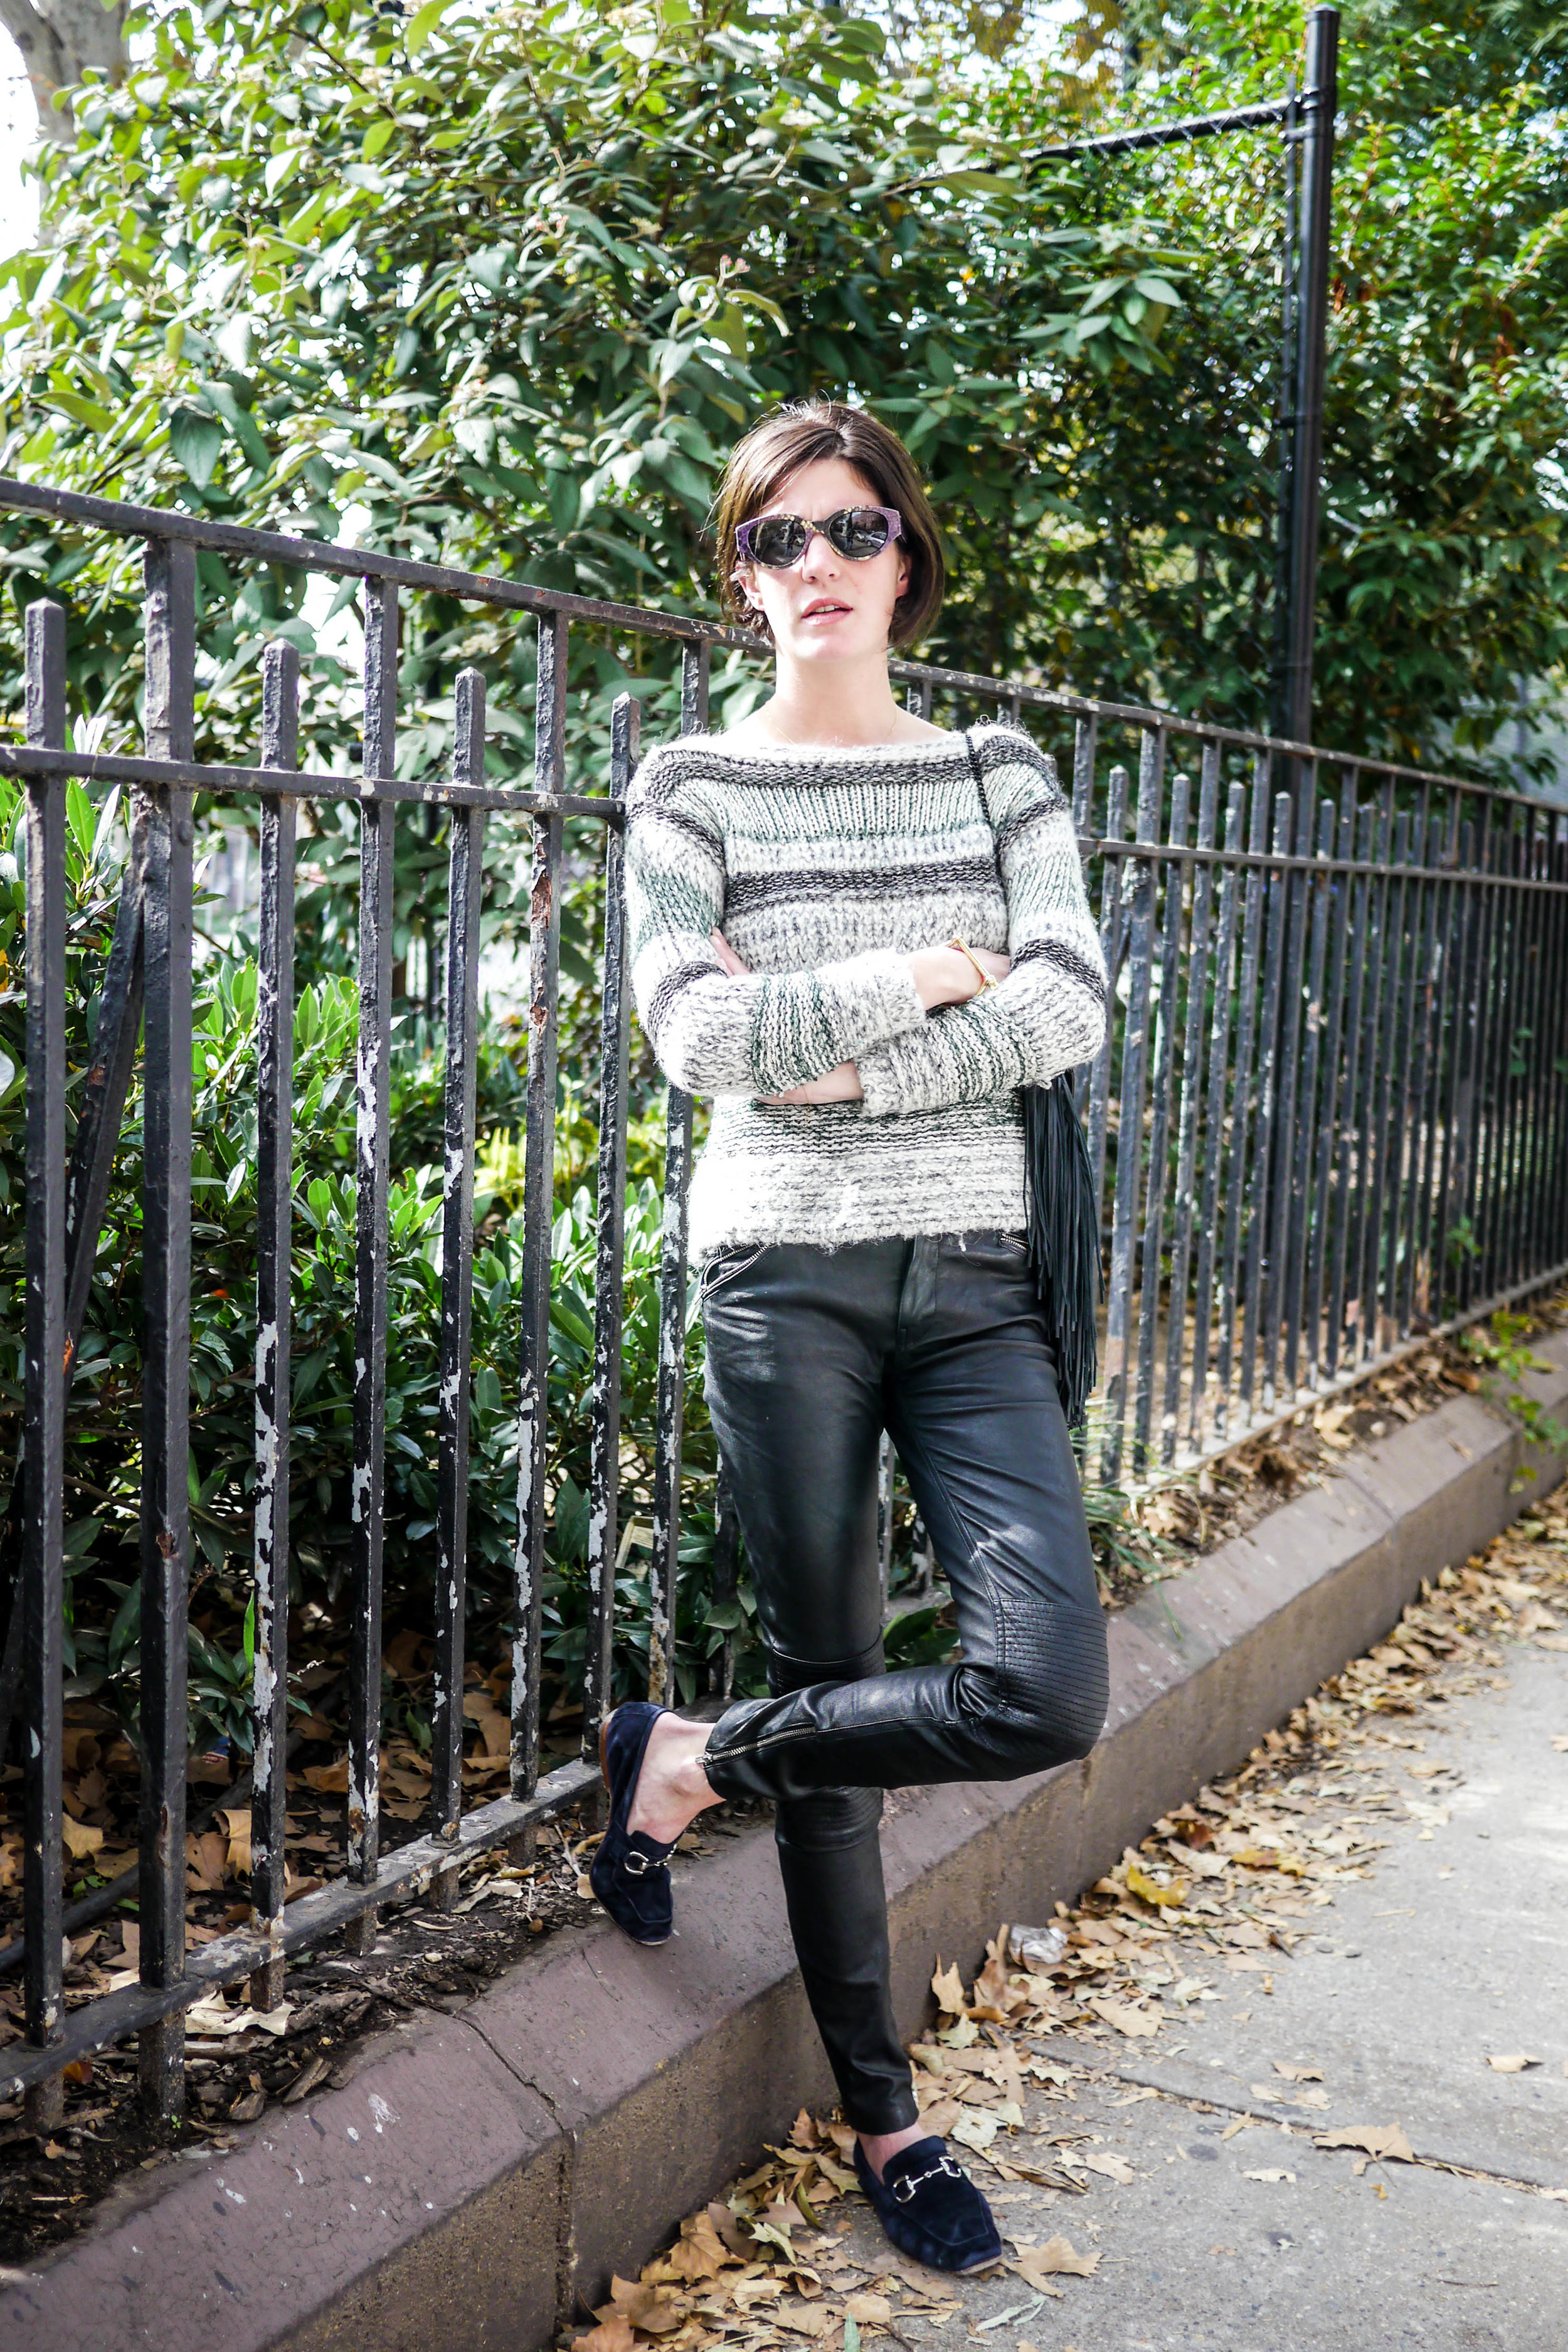 Sweater: Isabel Marant   ,    Pants: Blk Dnm   , Shoes: Vintage,    Sunglasses: Retrosuperfuture   ,    Bag: Loeffler Randall